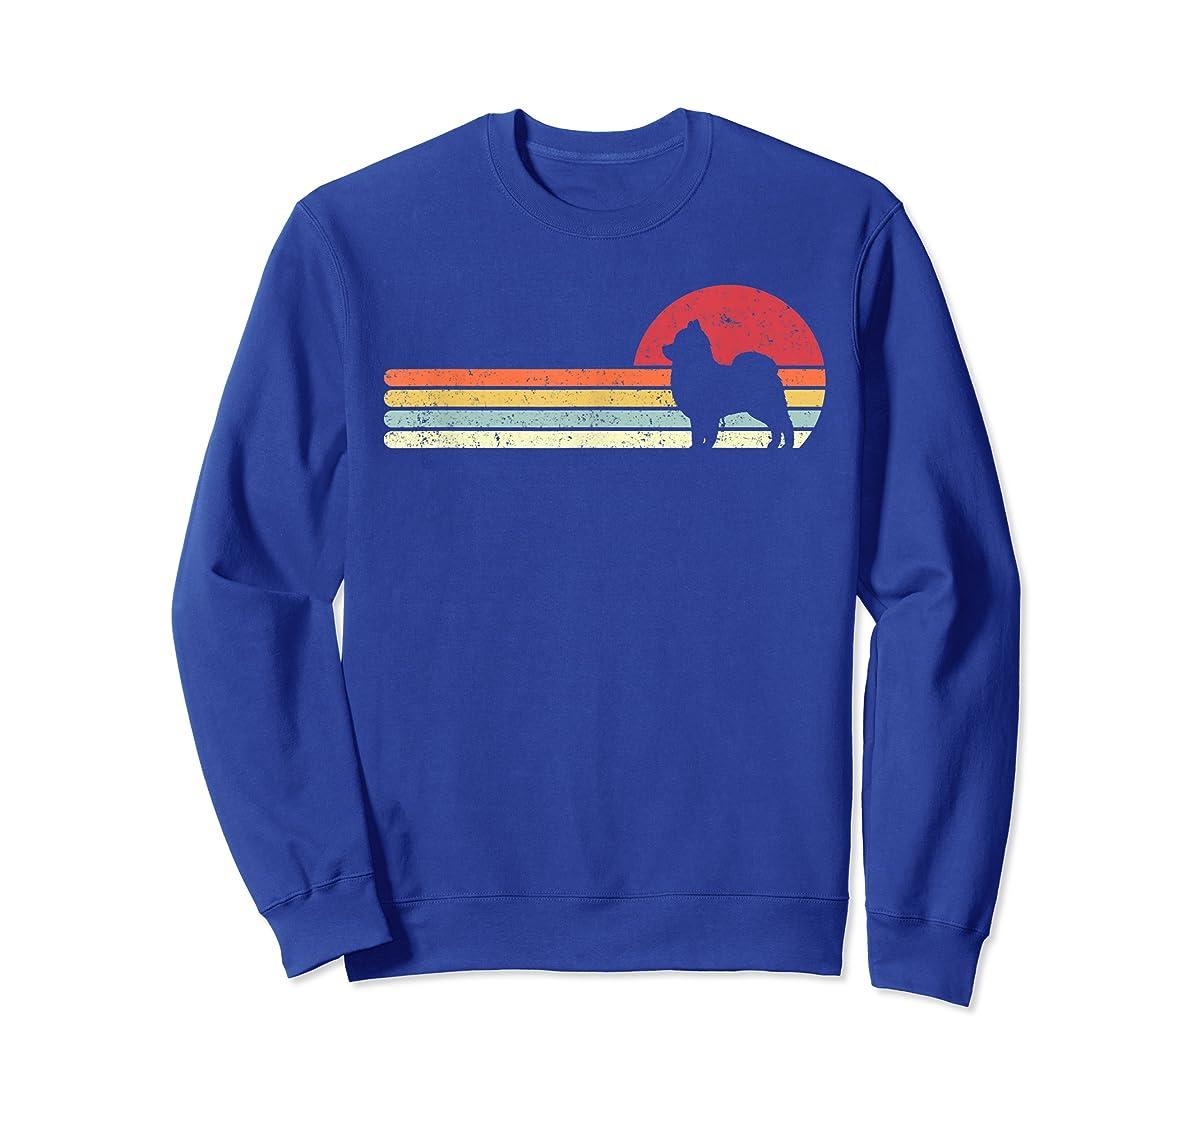 Pomeranian Shirt. Retro Style T-Shirt-Sweatshirt-Royal